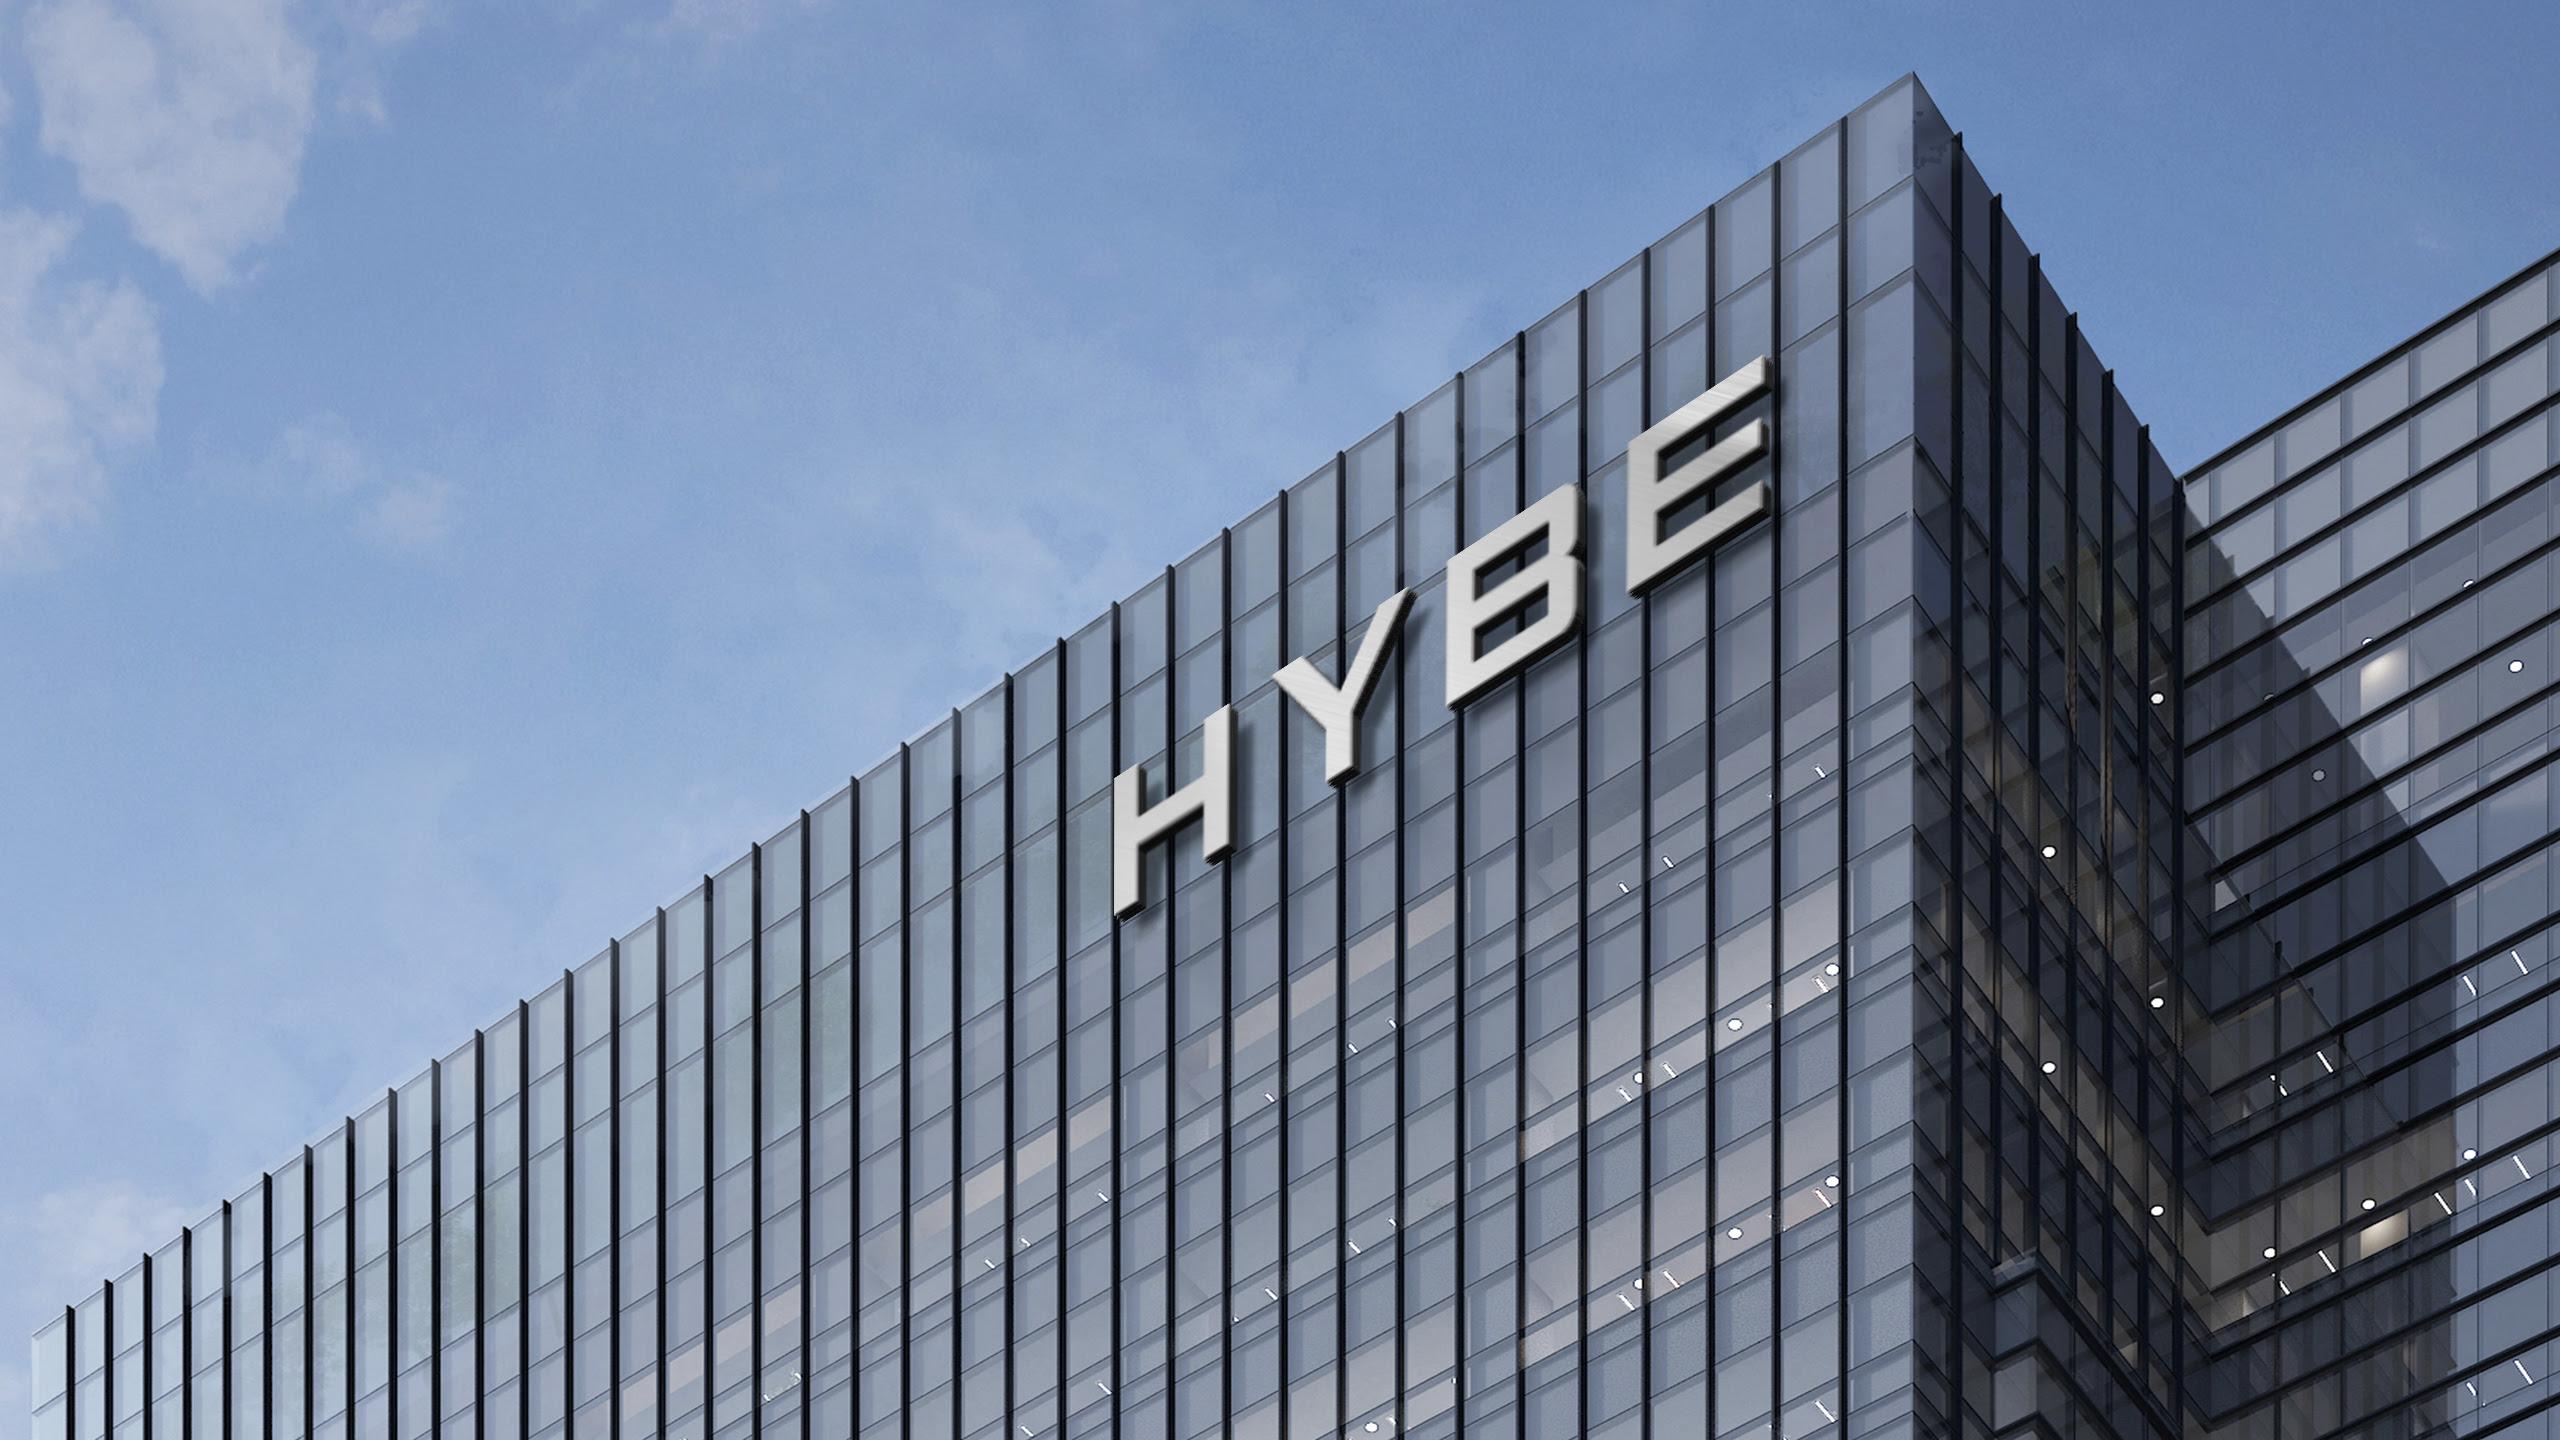 Bighit Entertainment rebranding as HYBE labels